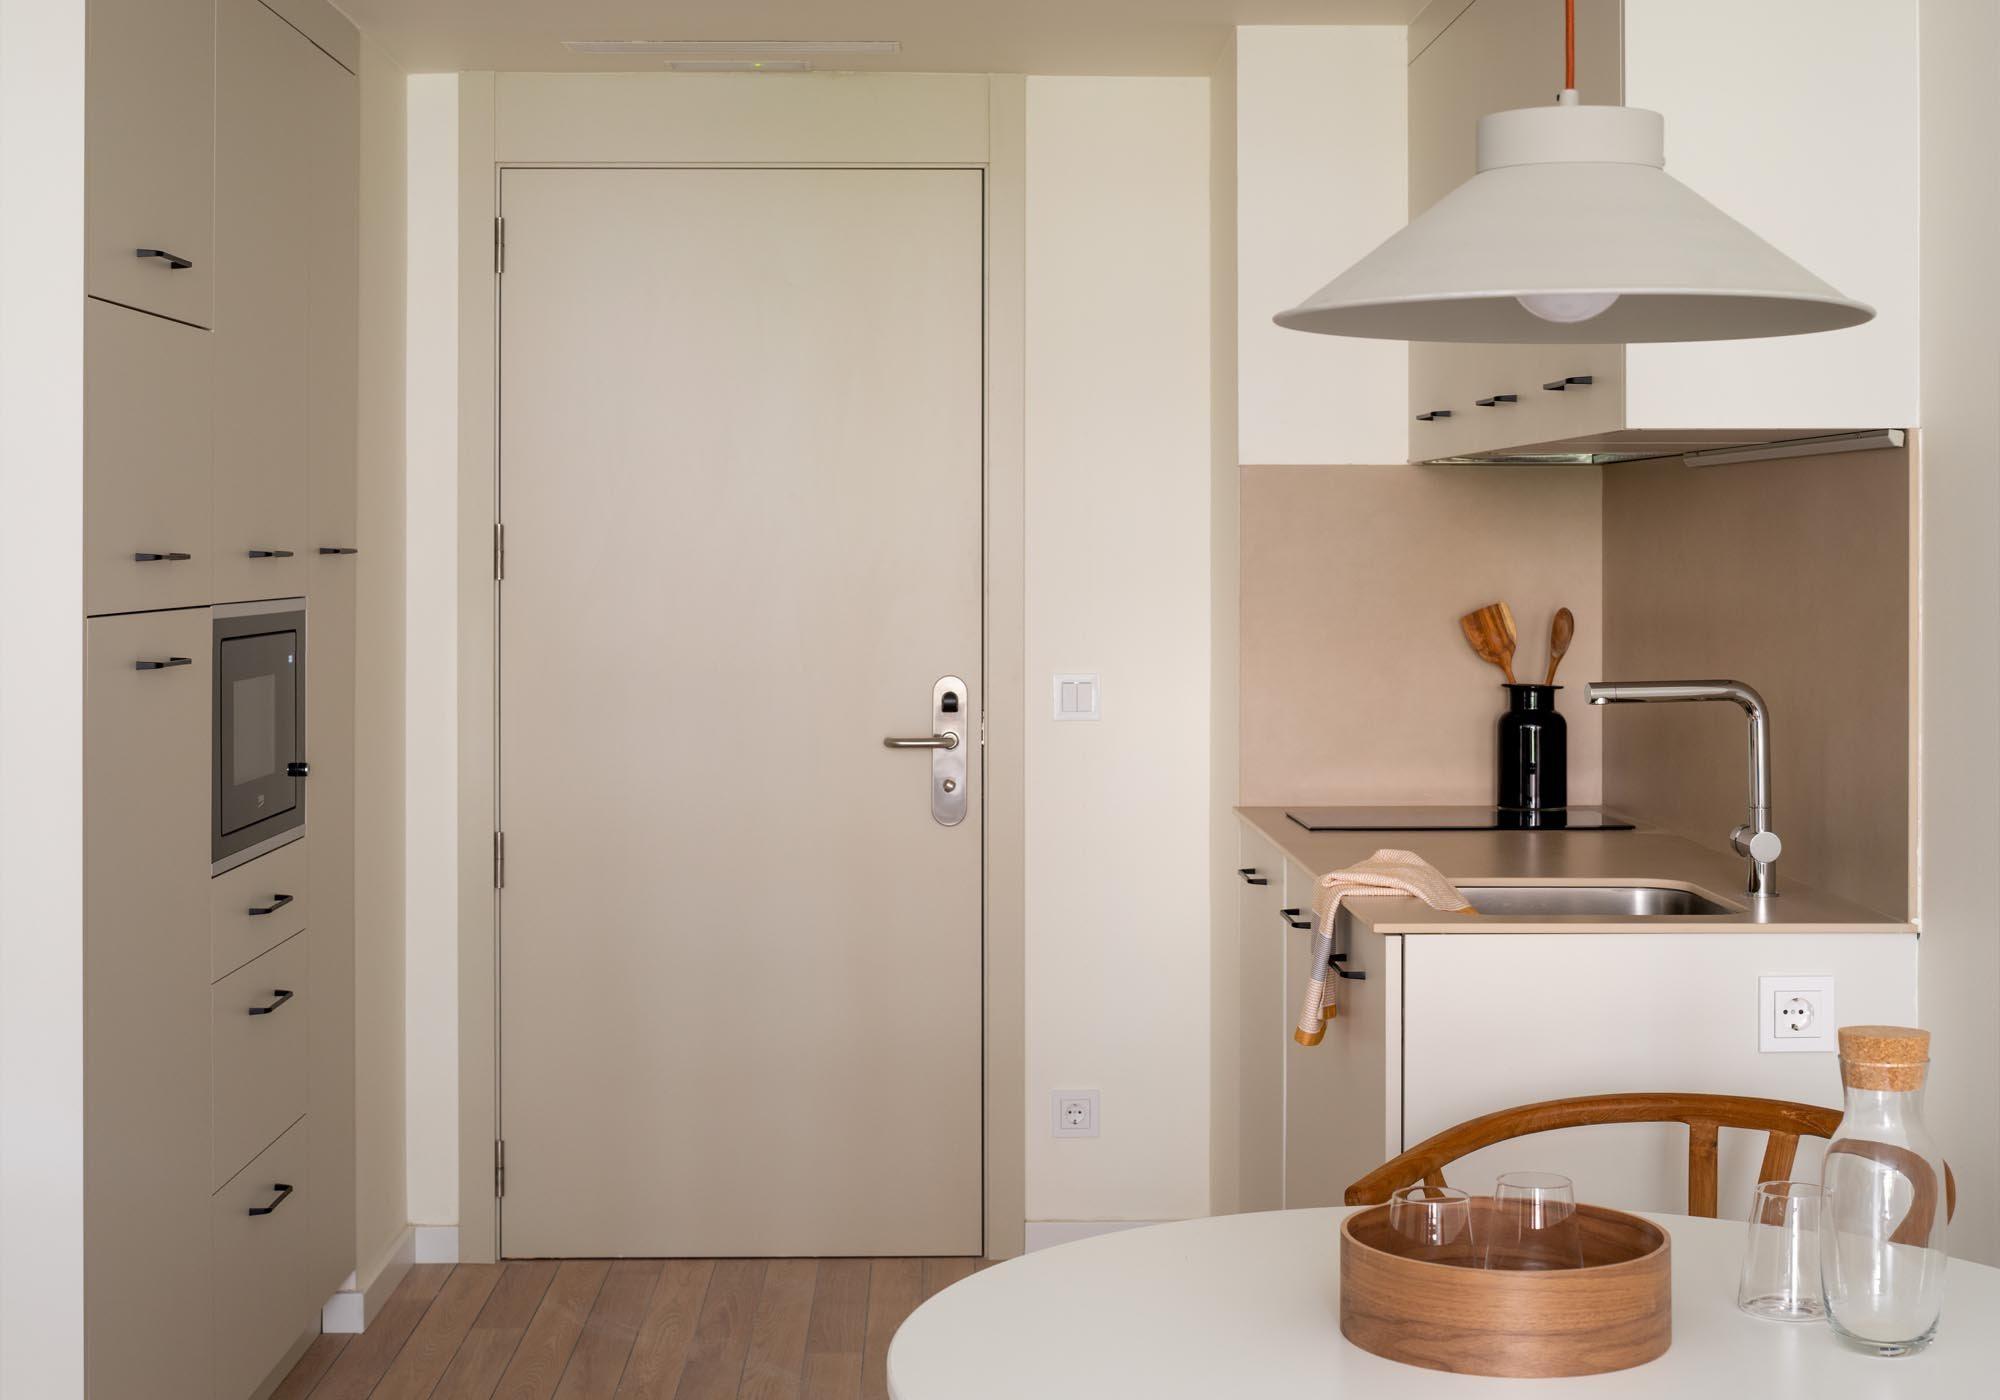 One bedroom apartment in Vitoria city centre